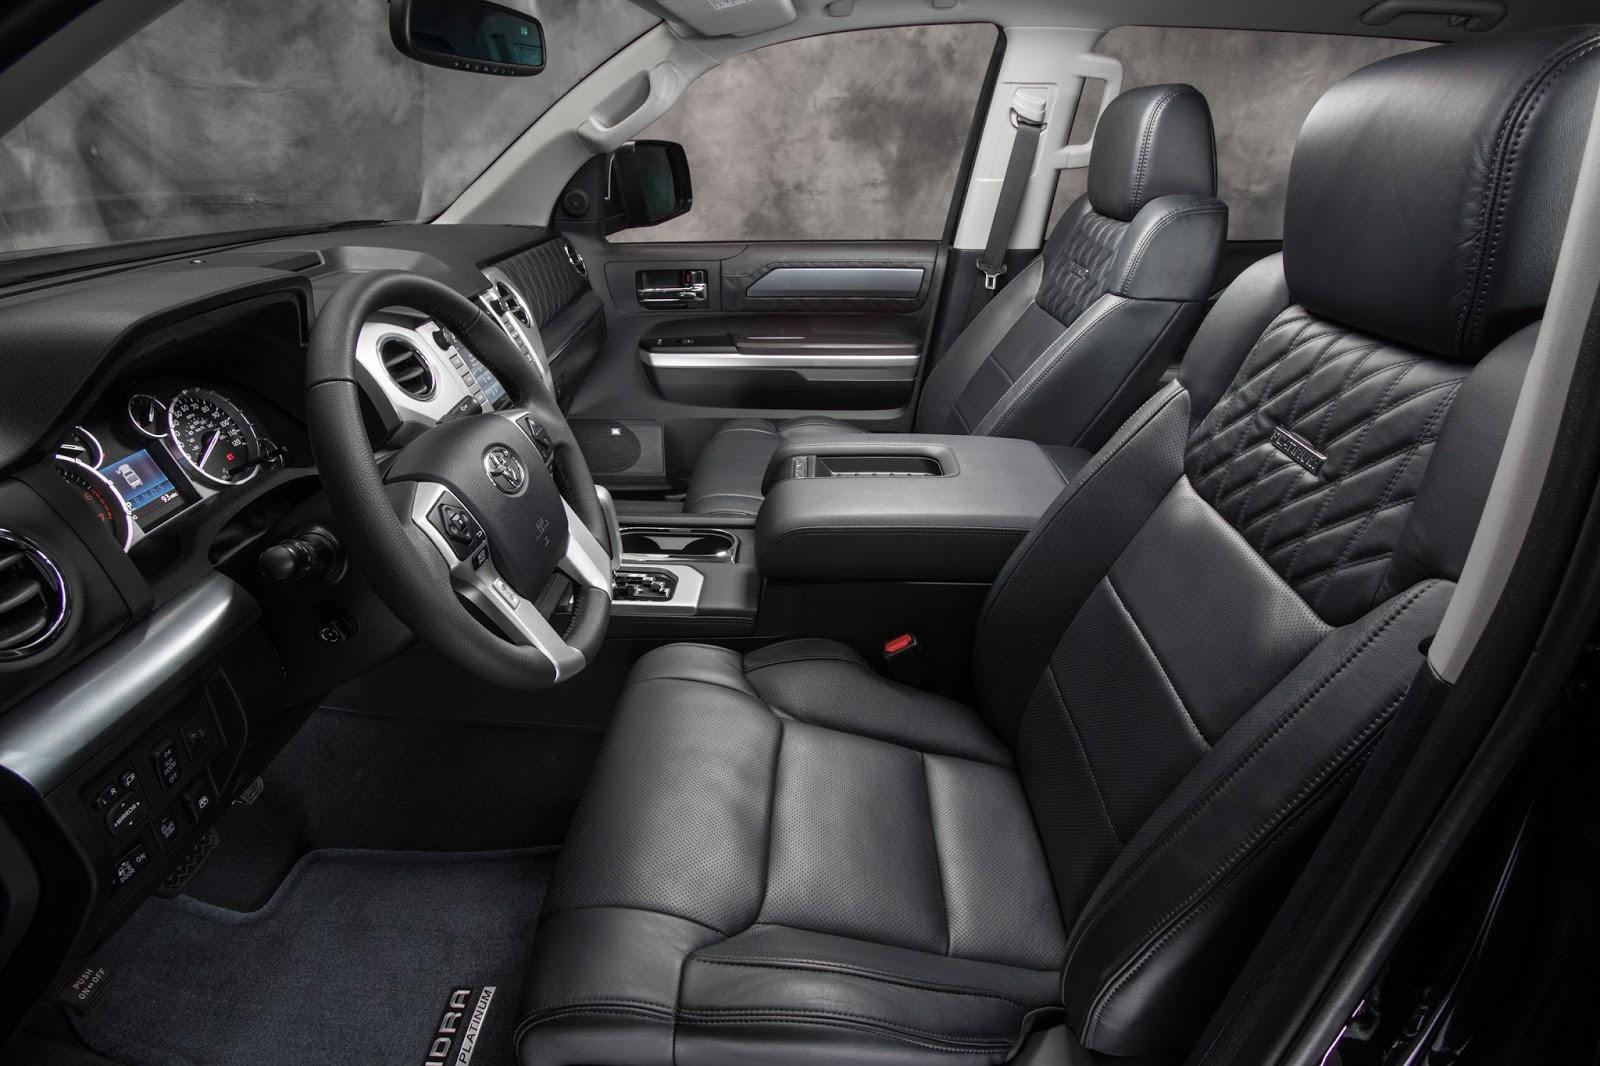 Interior View Of 2015 Toyota Tundra